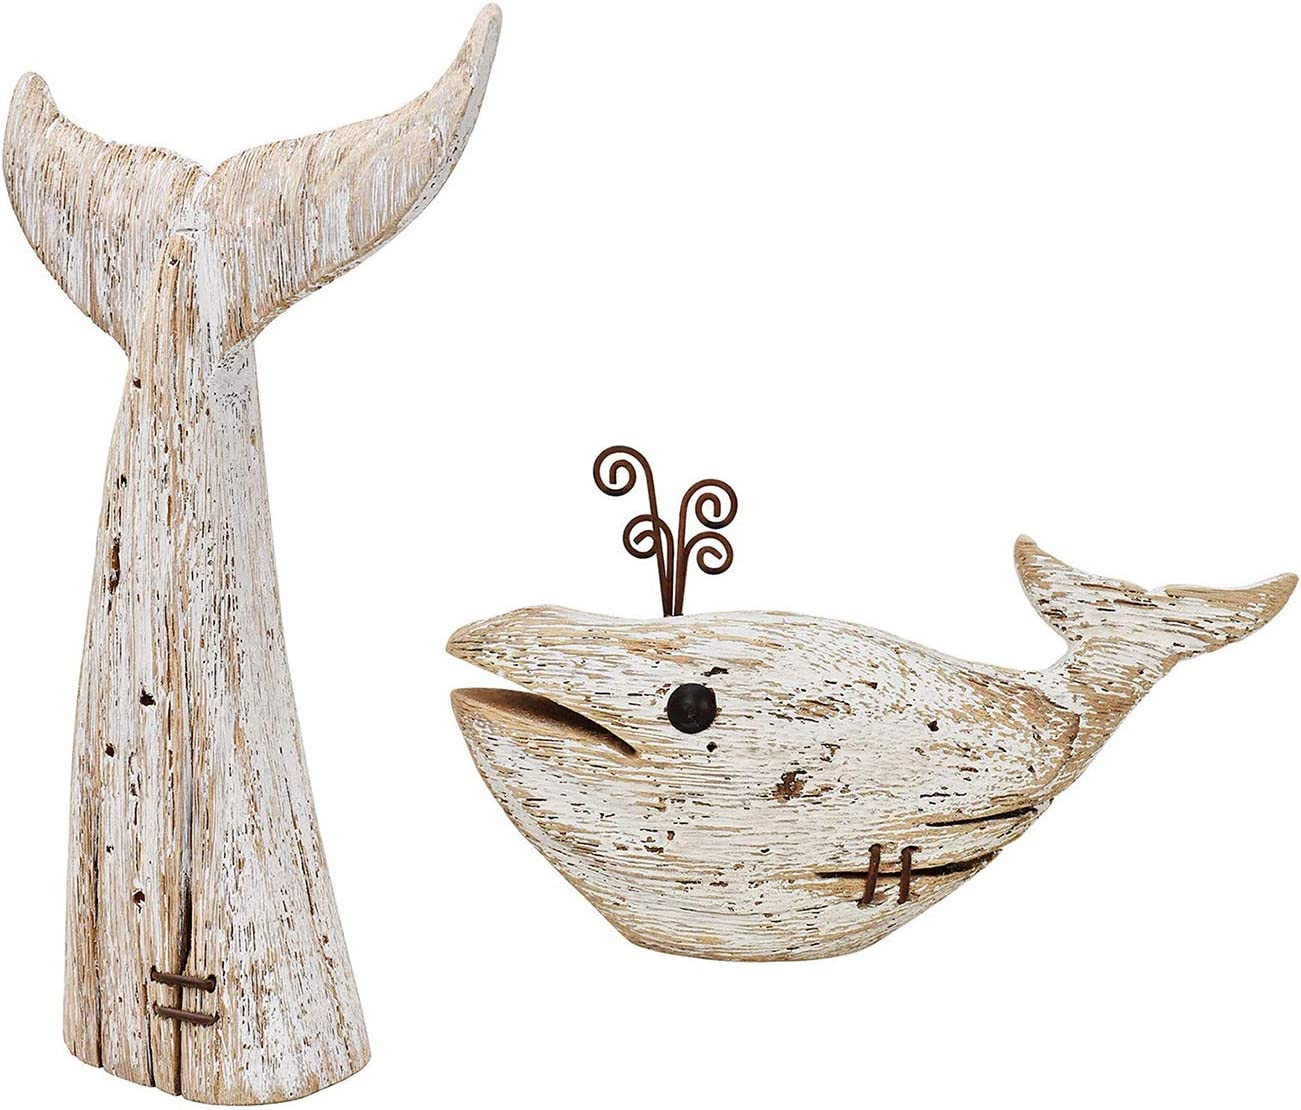 Wood Whale Statue Nautical 最安値挑戦 迅速な対応で商品をお届け致します Tabletop Rustic Fi Animal Decor